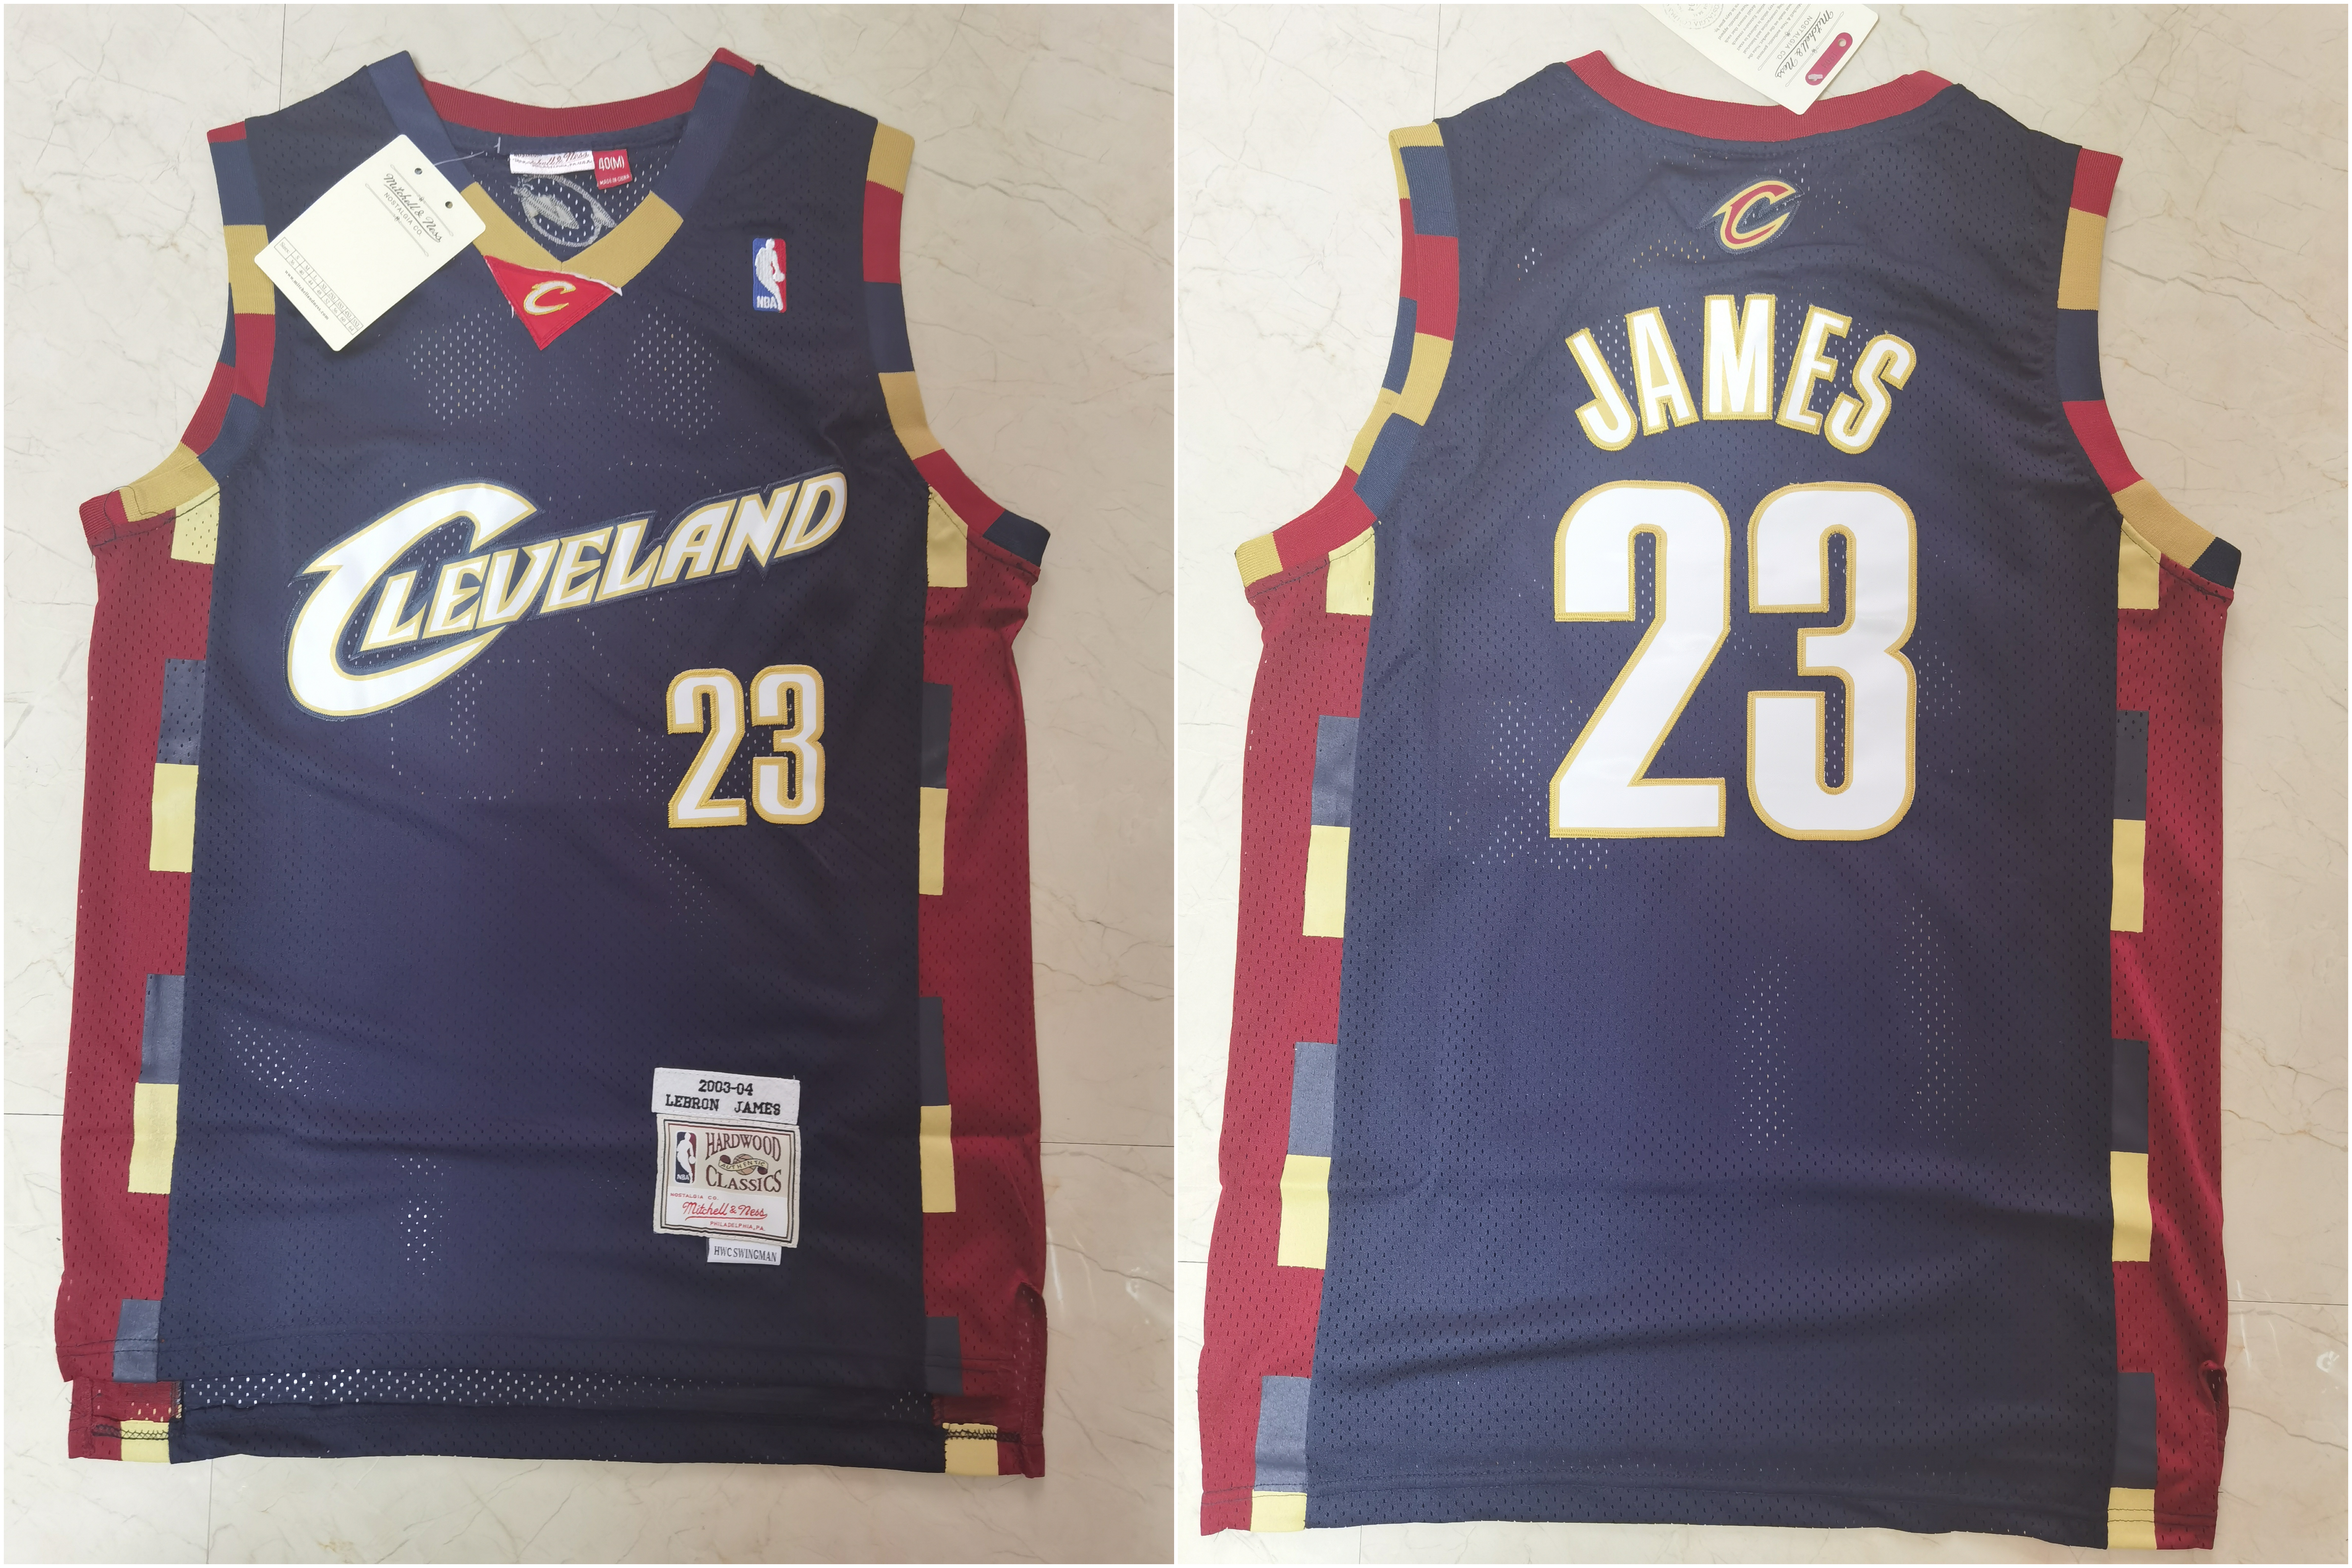 Cavaliers 23 Lebron James Black 2003-04 Hardwood Classics Jersey